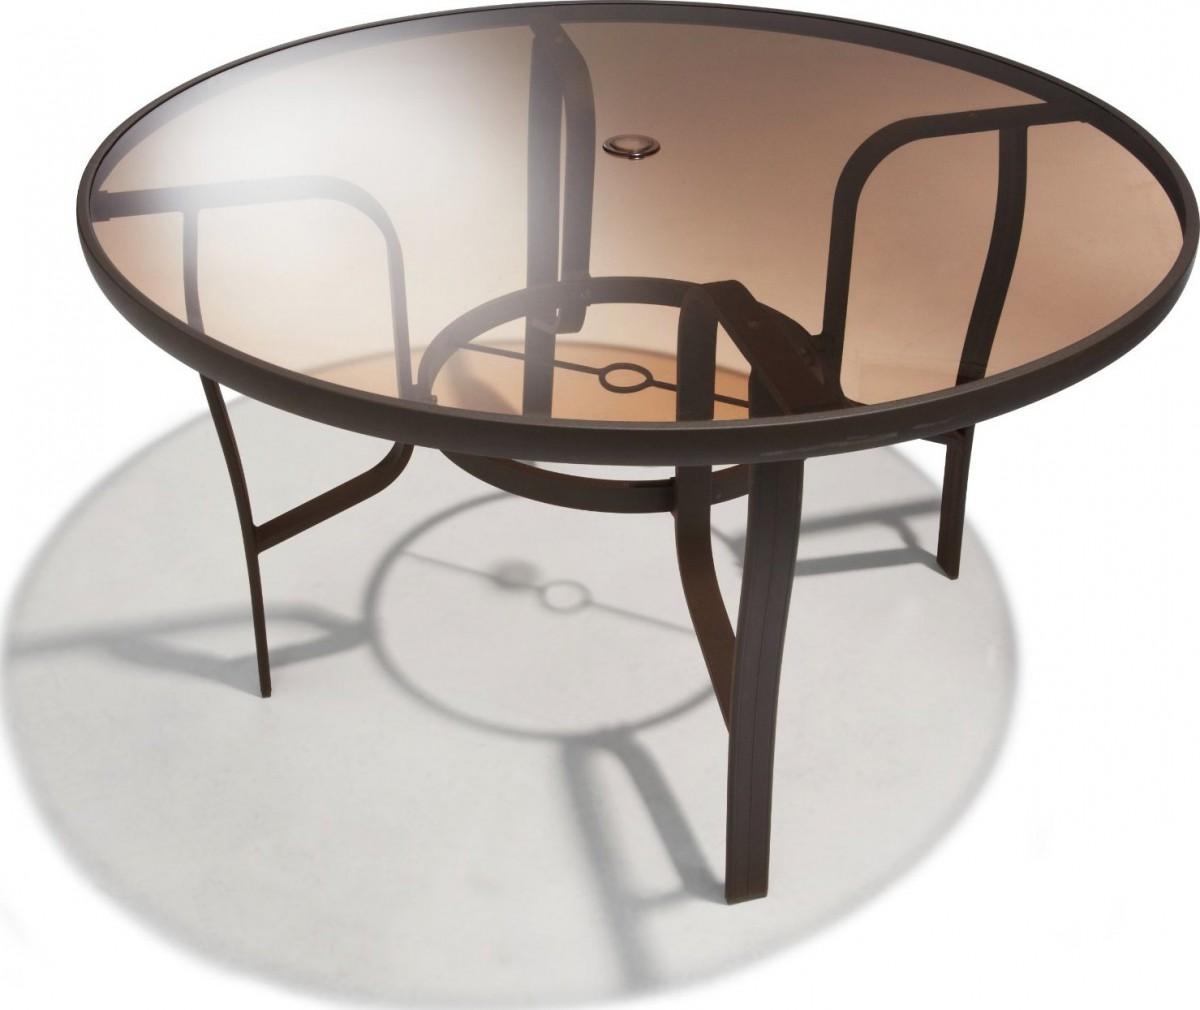 Strathwood Rawley 48-Inch Round Dining Table